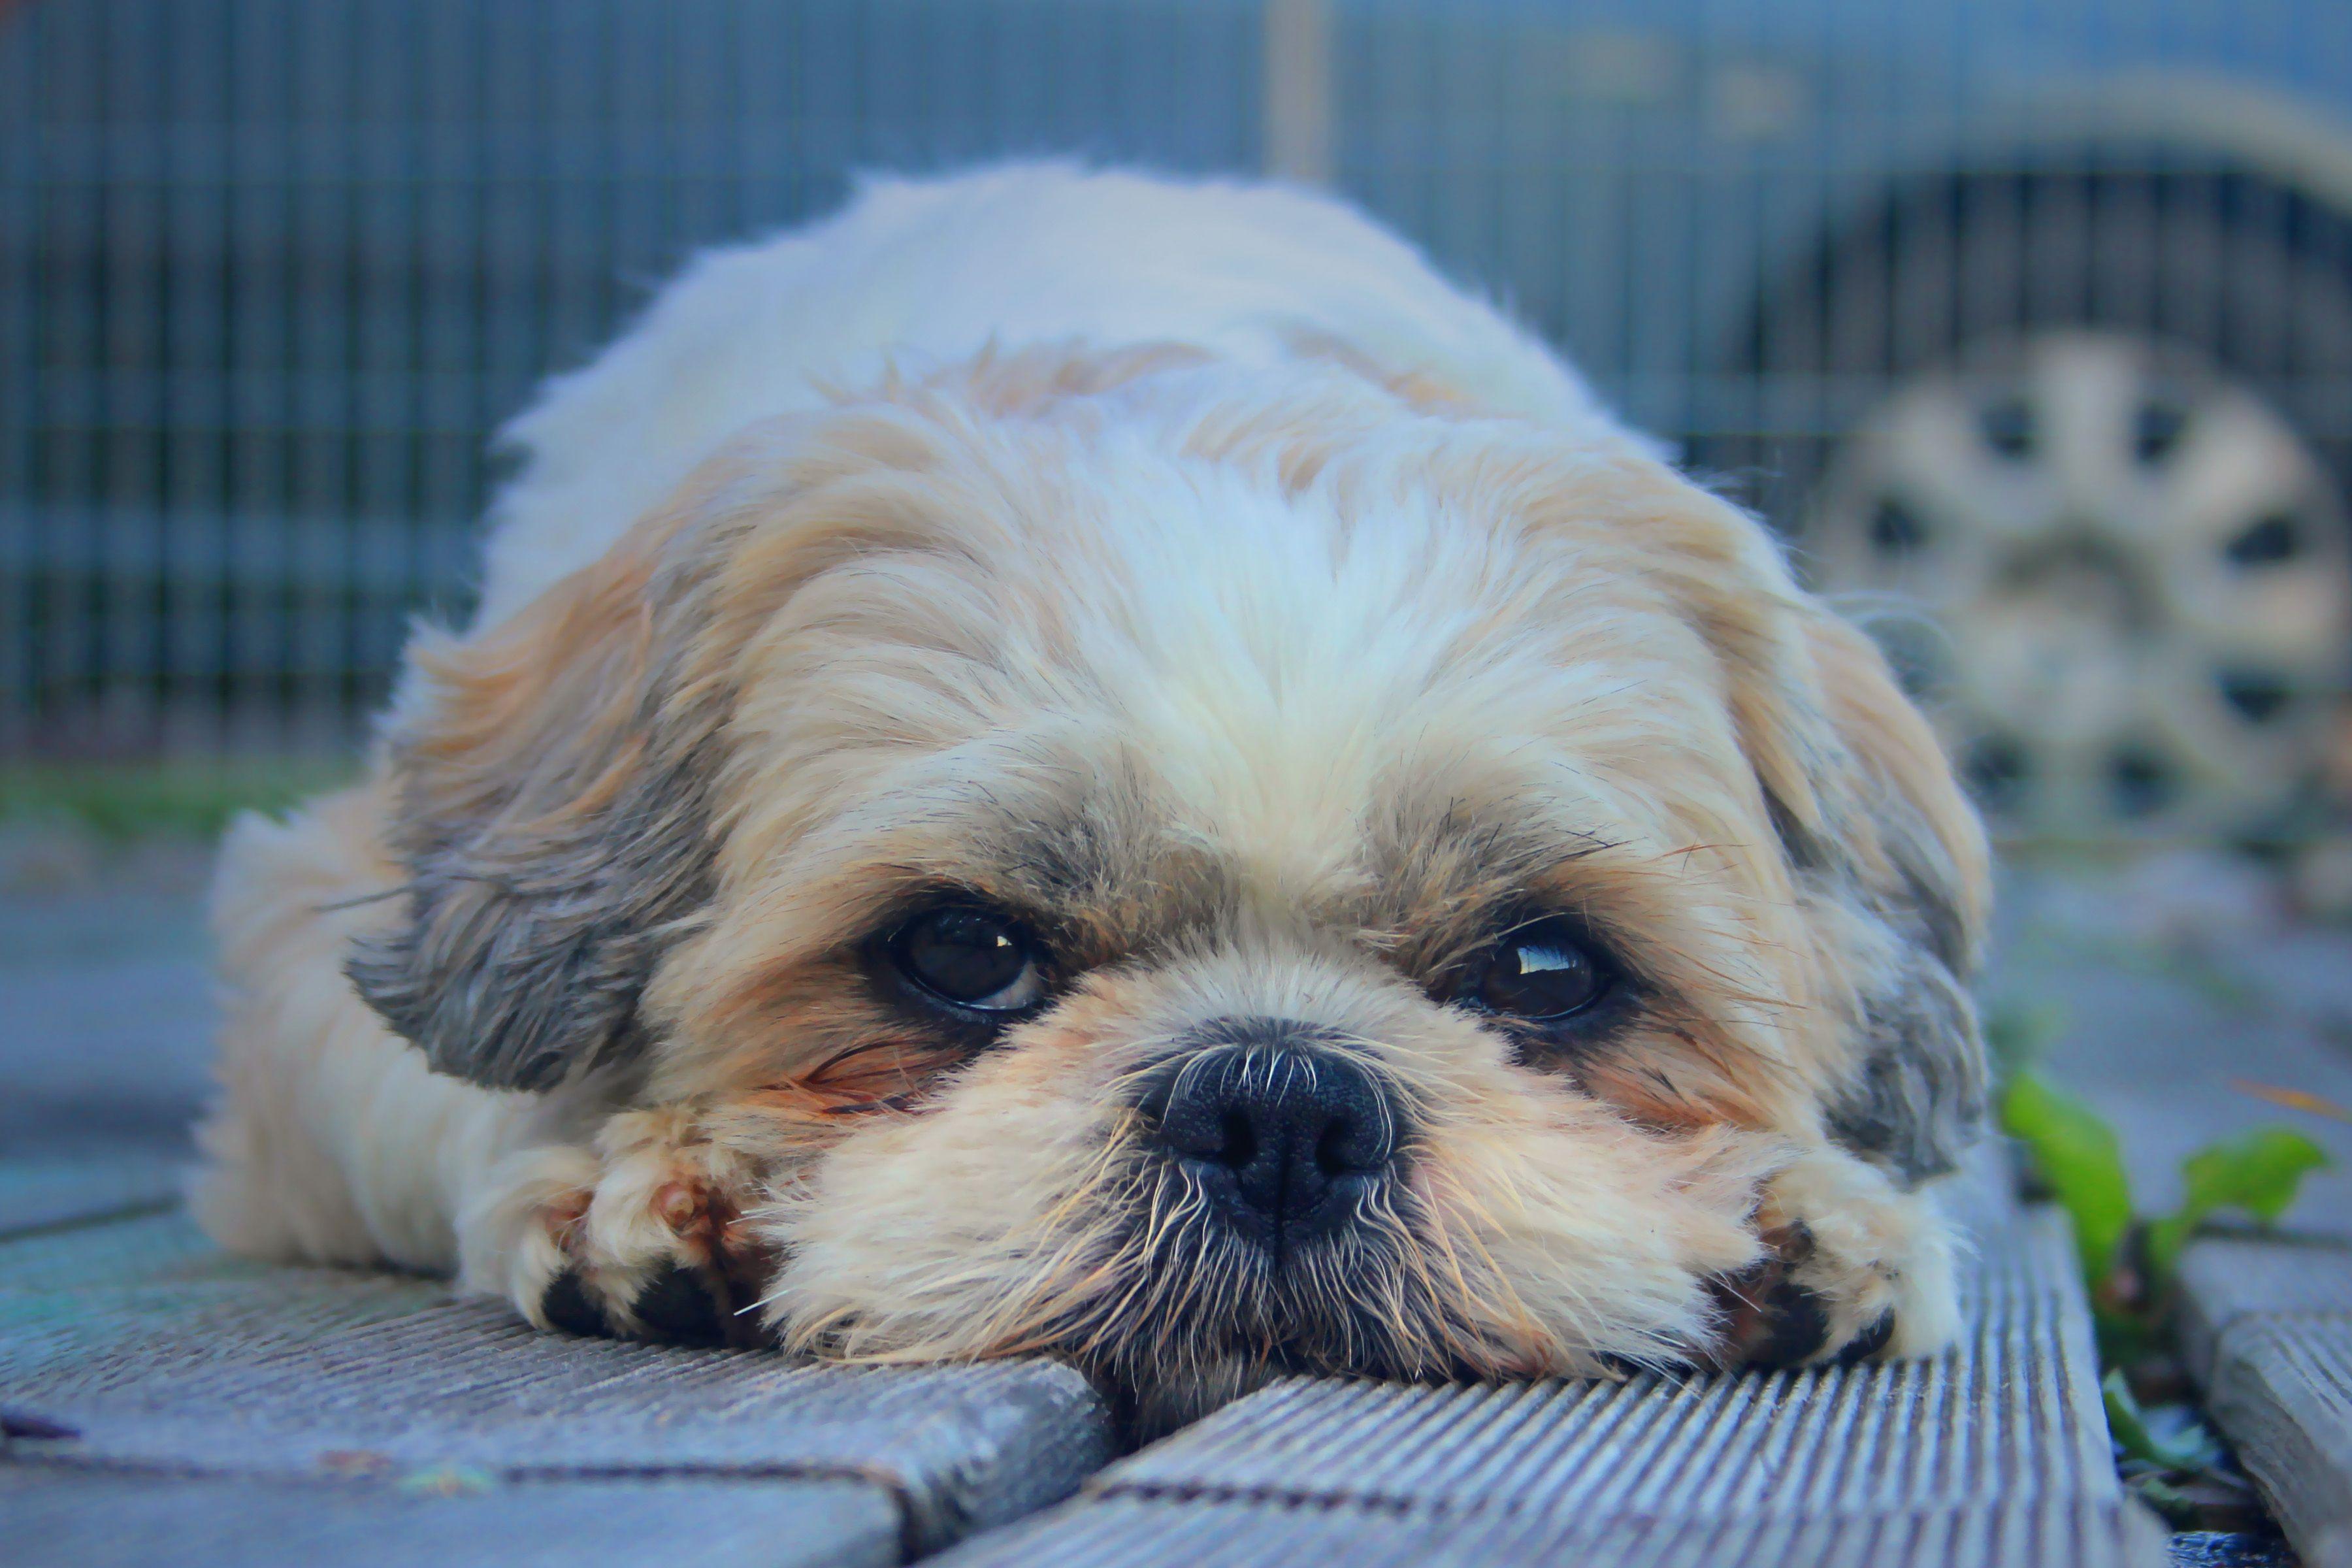 Animal Wallpaper Background Shih Tzu Dog Muzzle